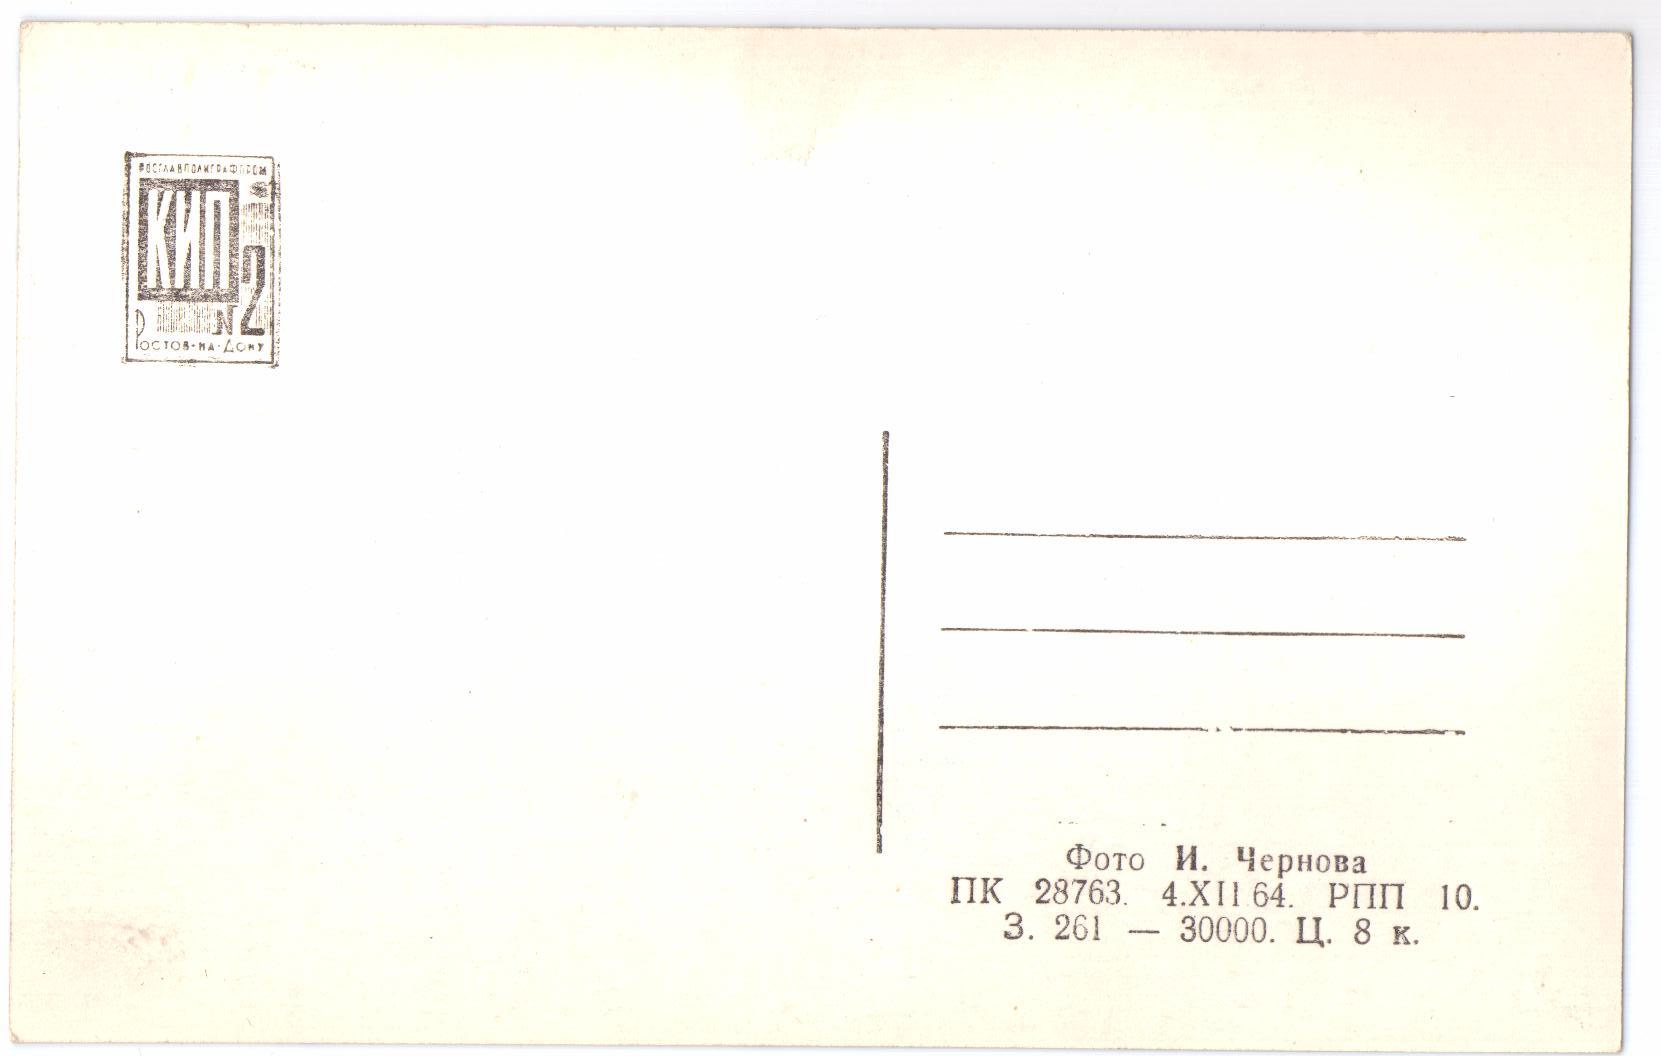 kip-261-2